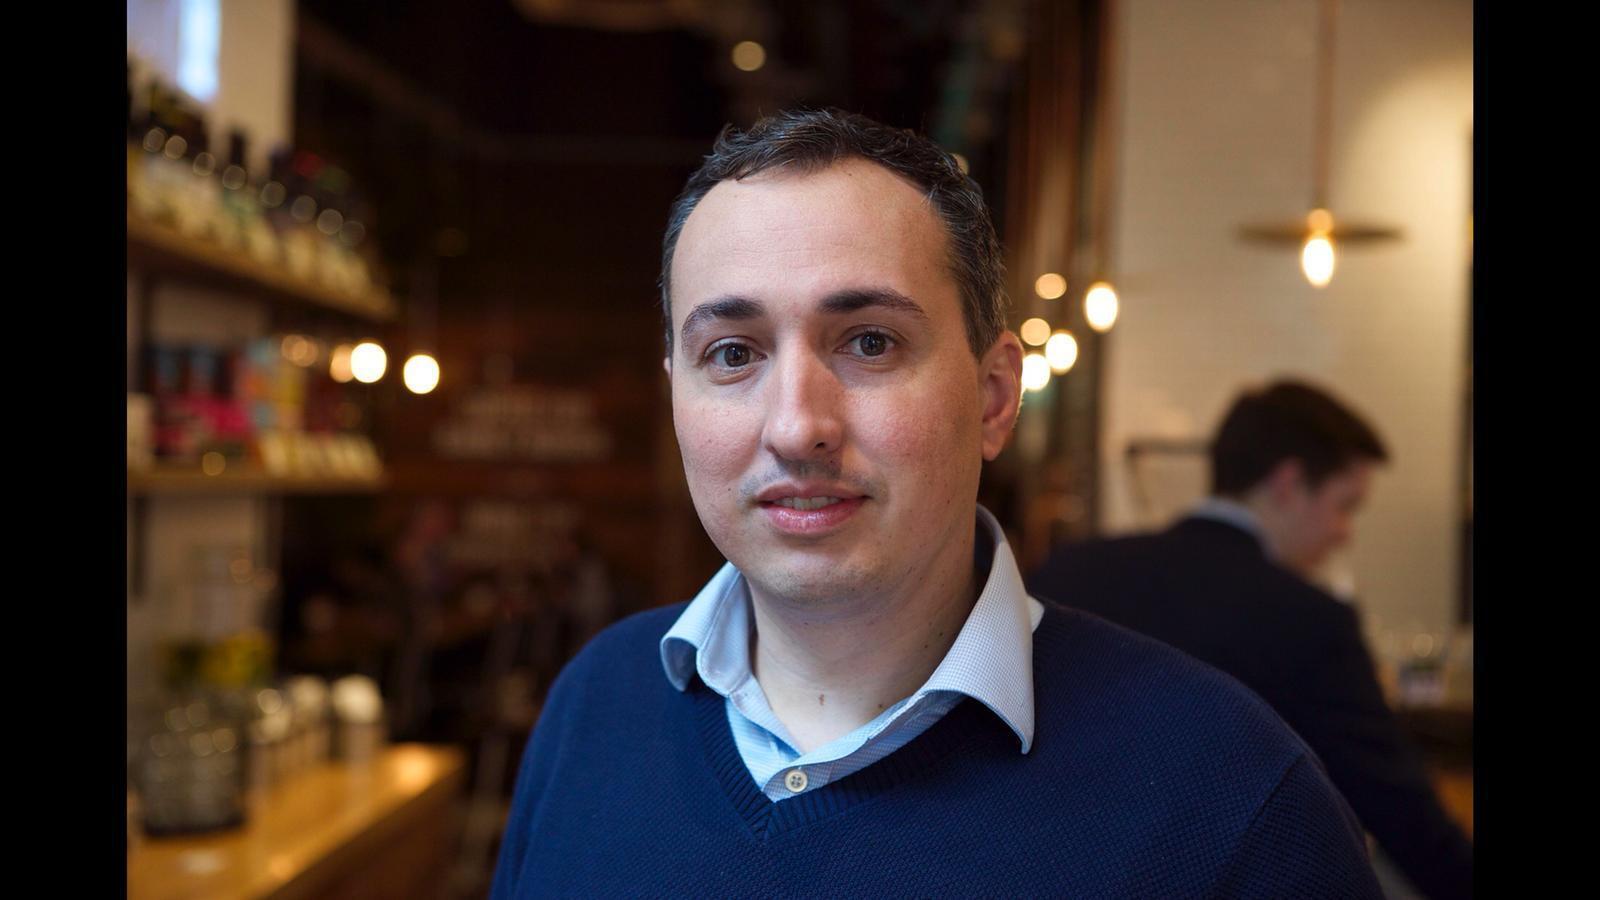 O barista empreendedor, Fábio Ferreira co-fundador do Notes Coffee Roasters & Bars